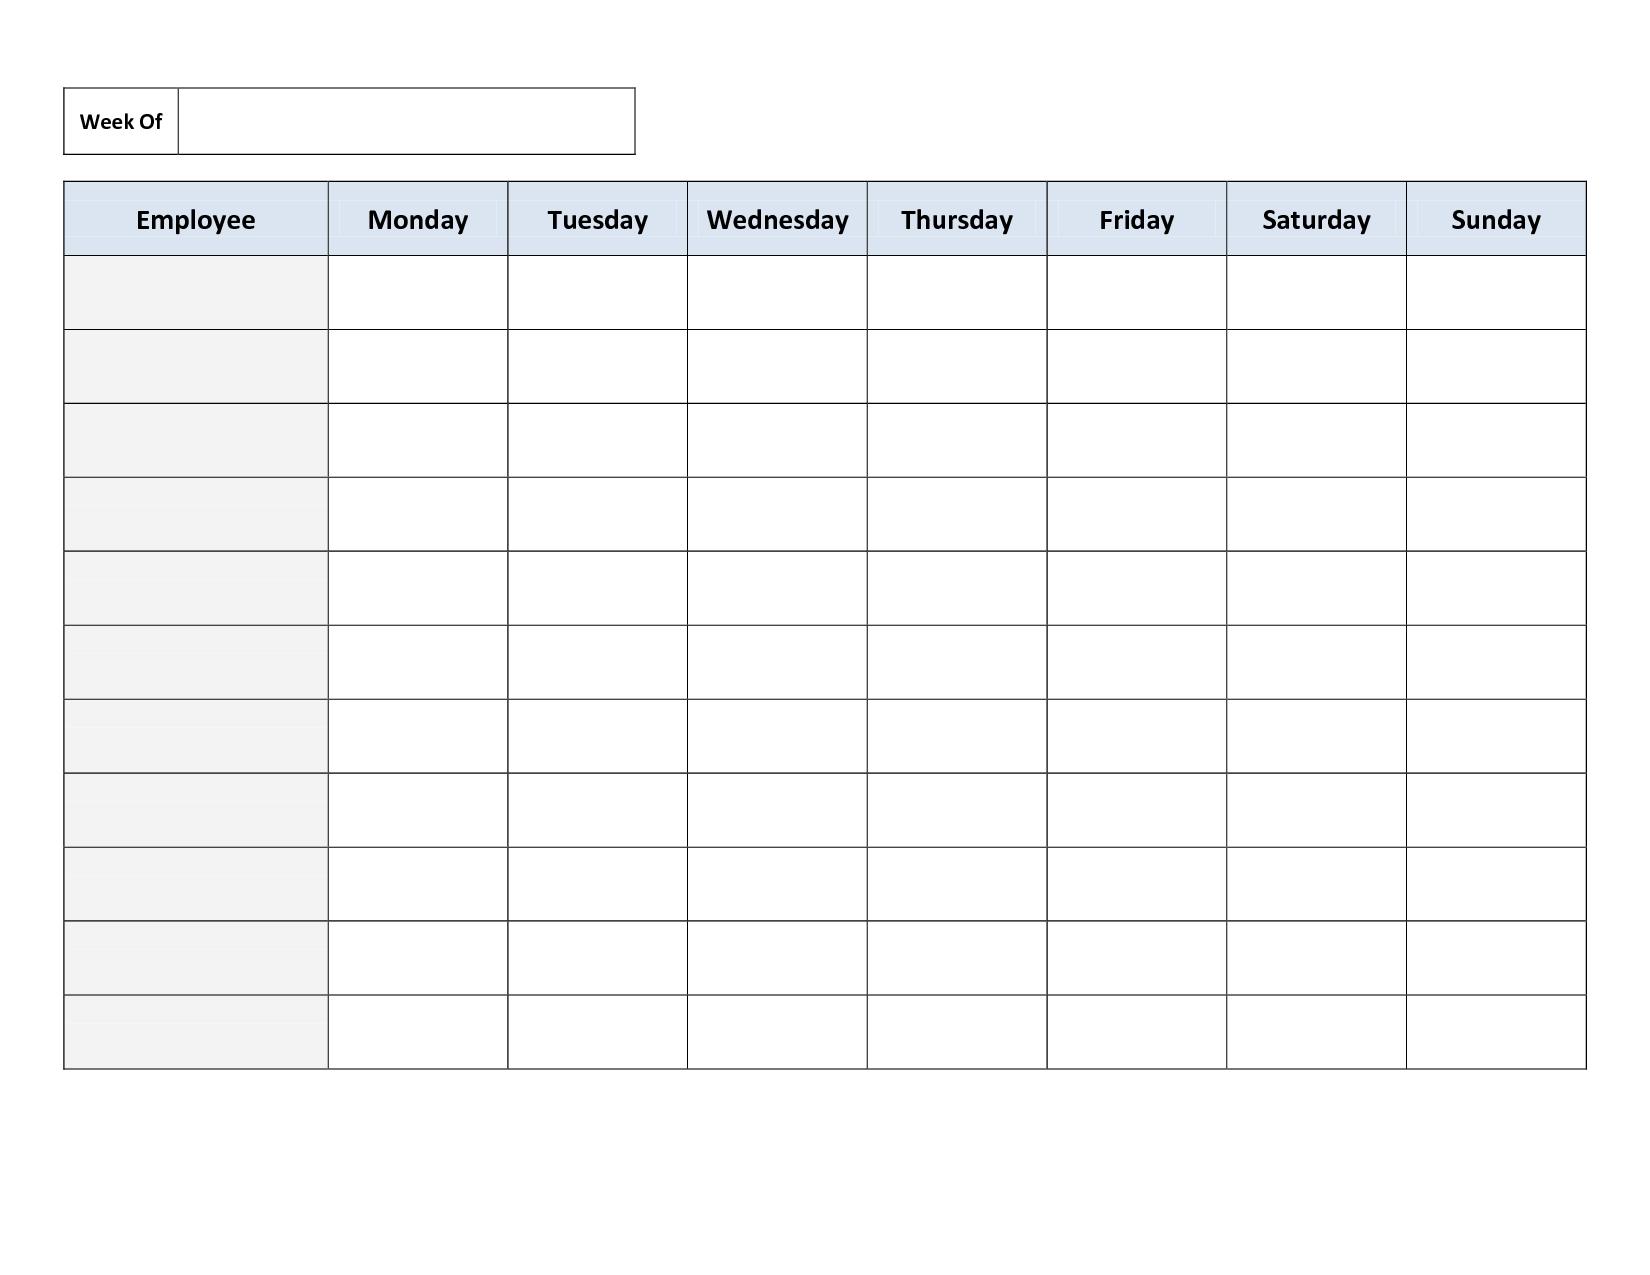 Weekly Employee Work Schedule Template. Free Blank Schedule